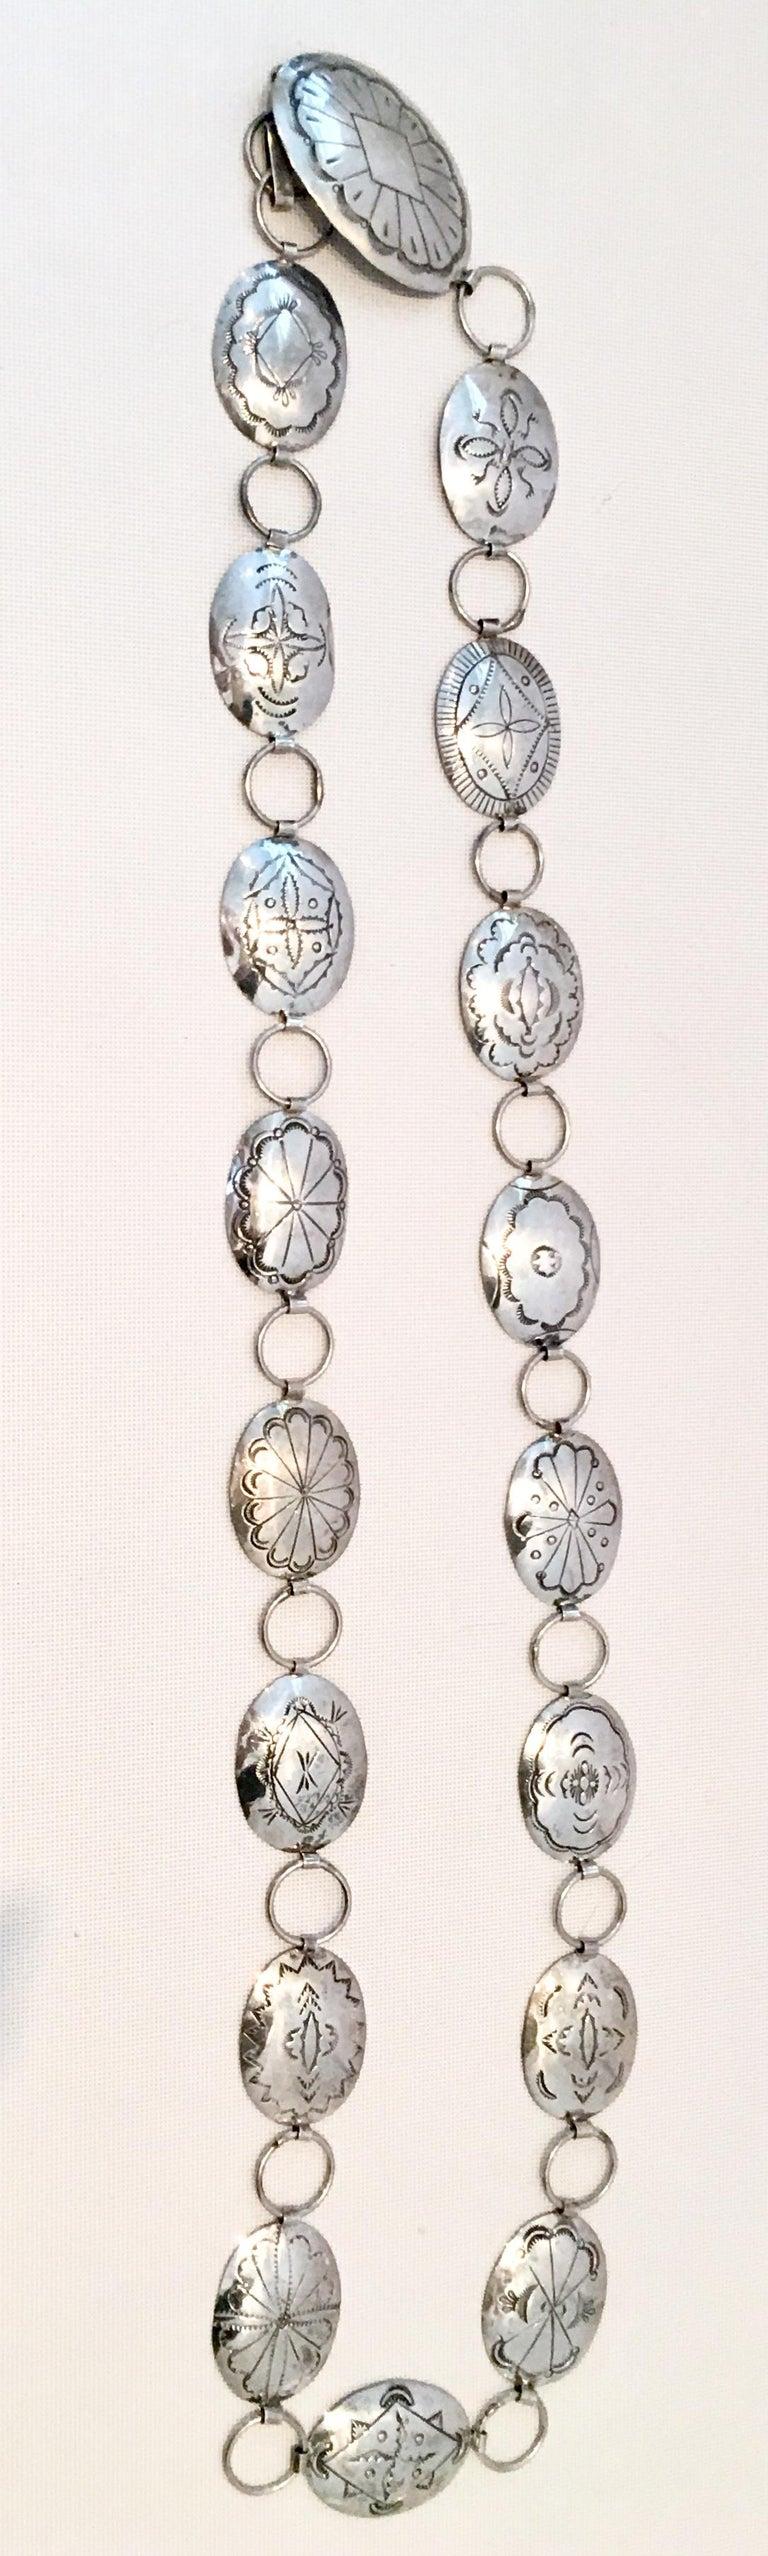 70s Native American Sterling Silver Concho Belt By Wilbur Wauneka